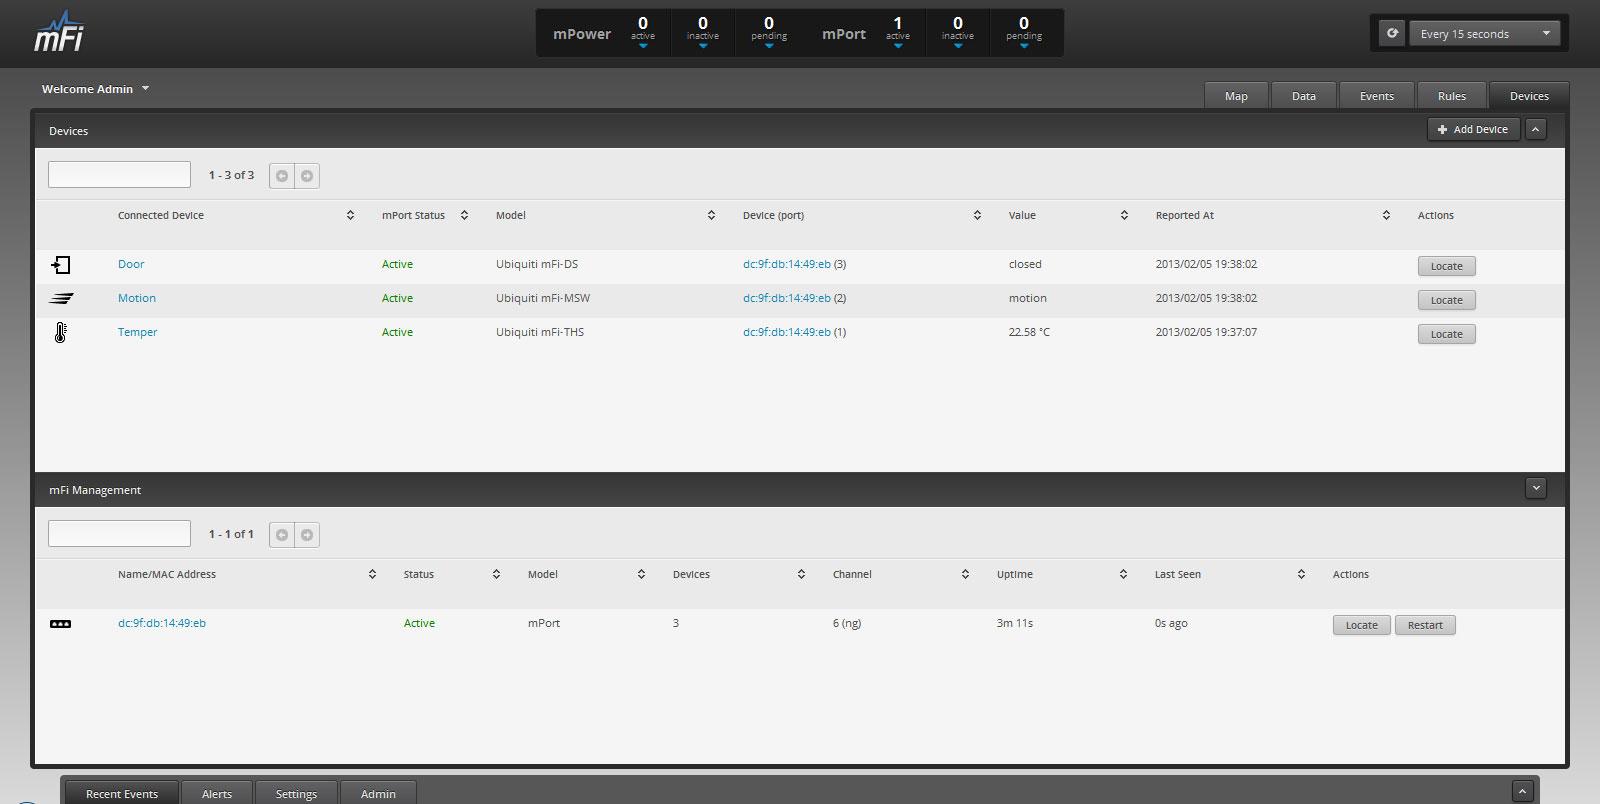 Ubiquiti Networks mController статус и состояние сенсоров